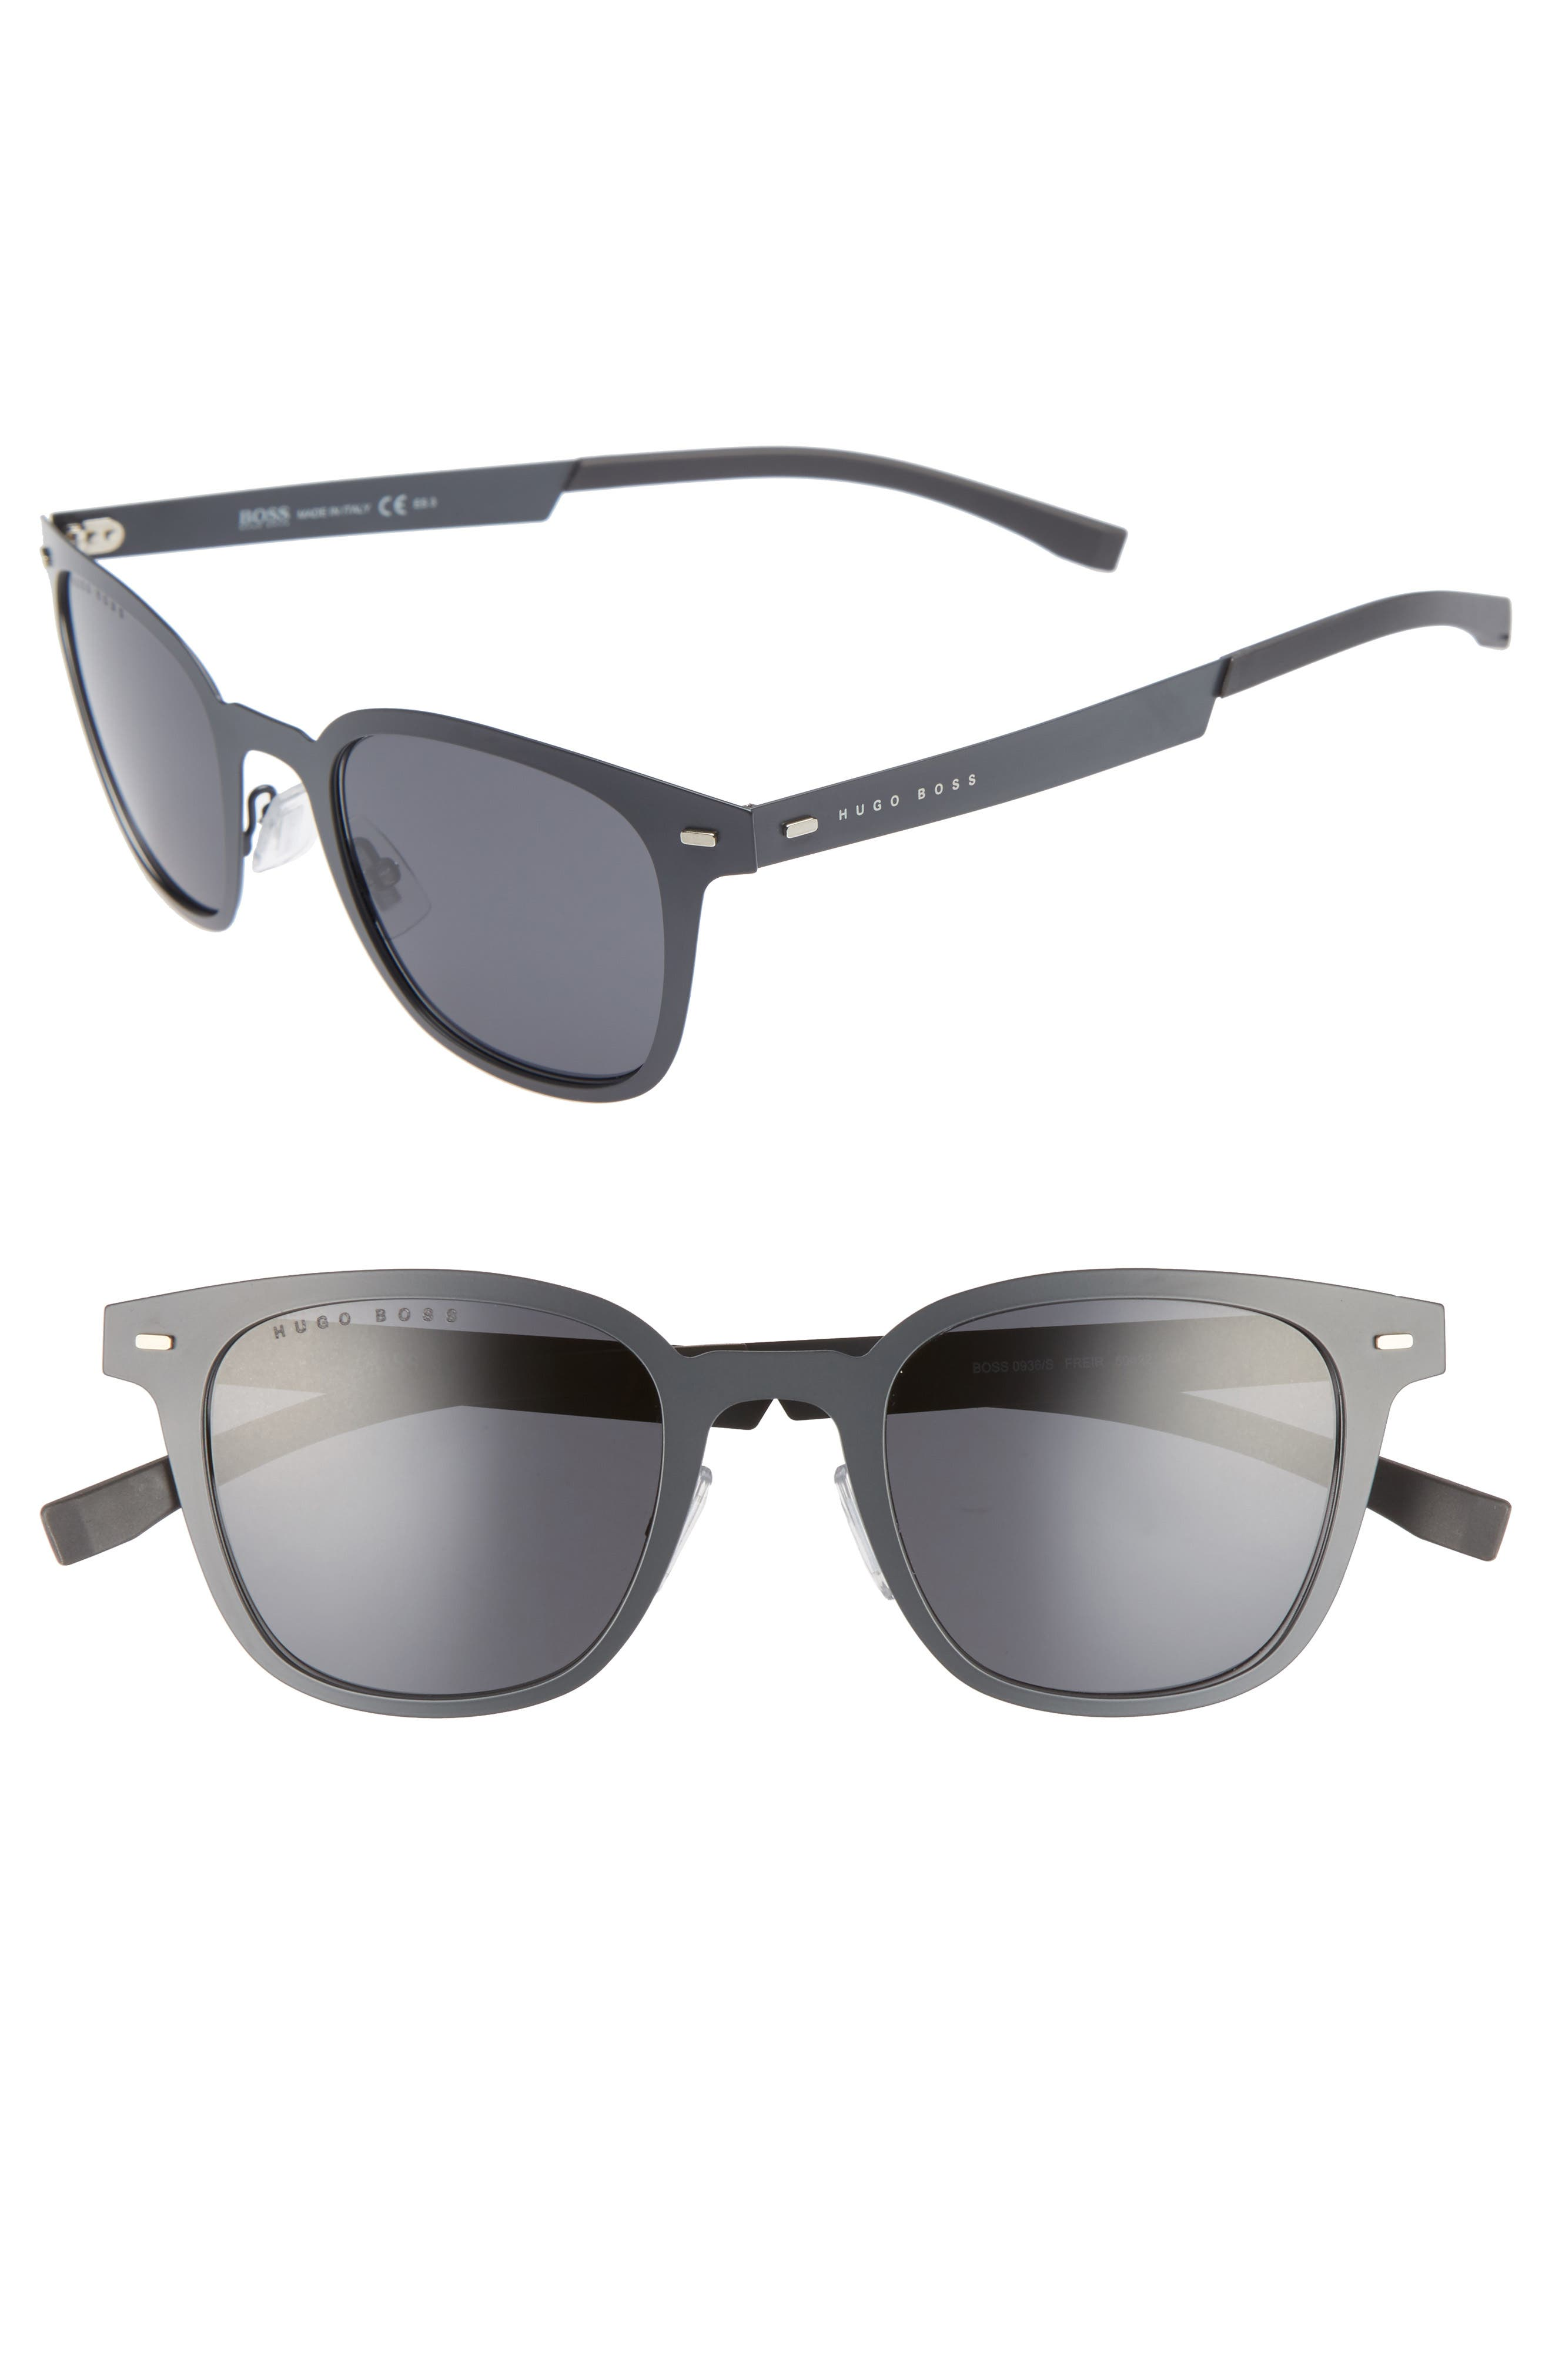 Main Image - BOSS 50mm Sunglasses